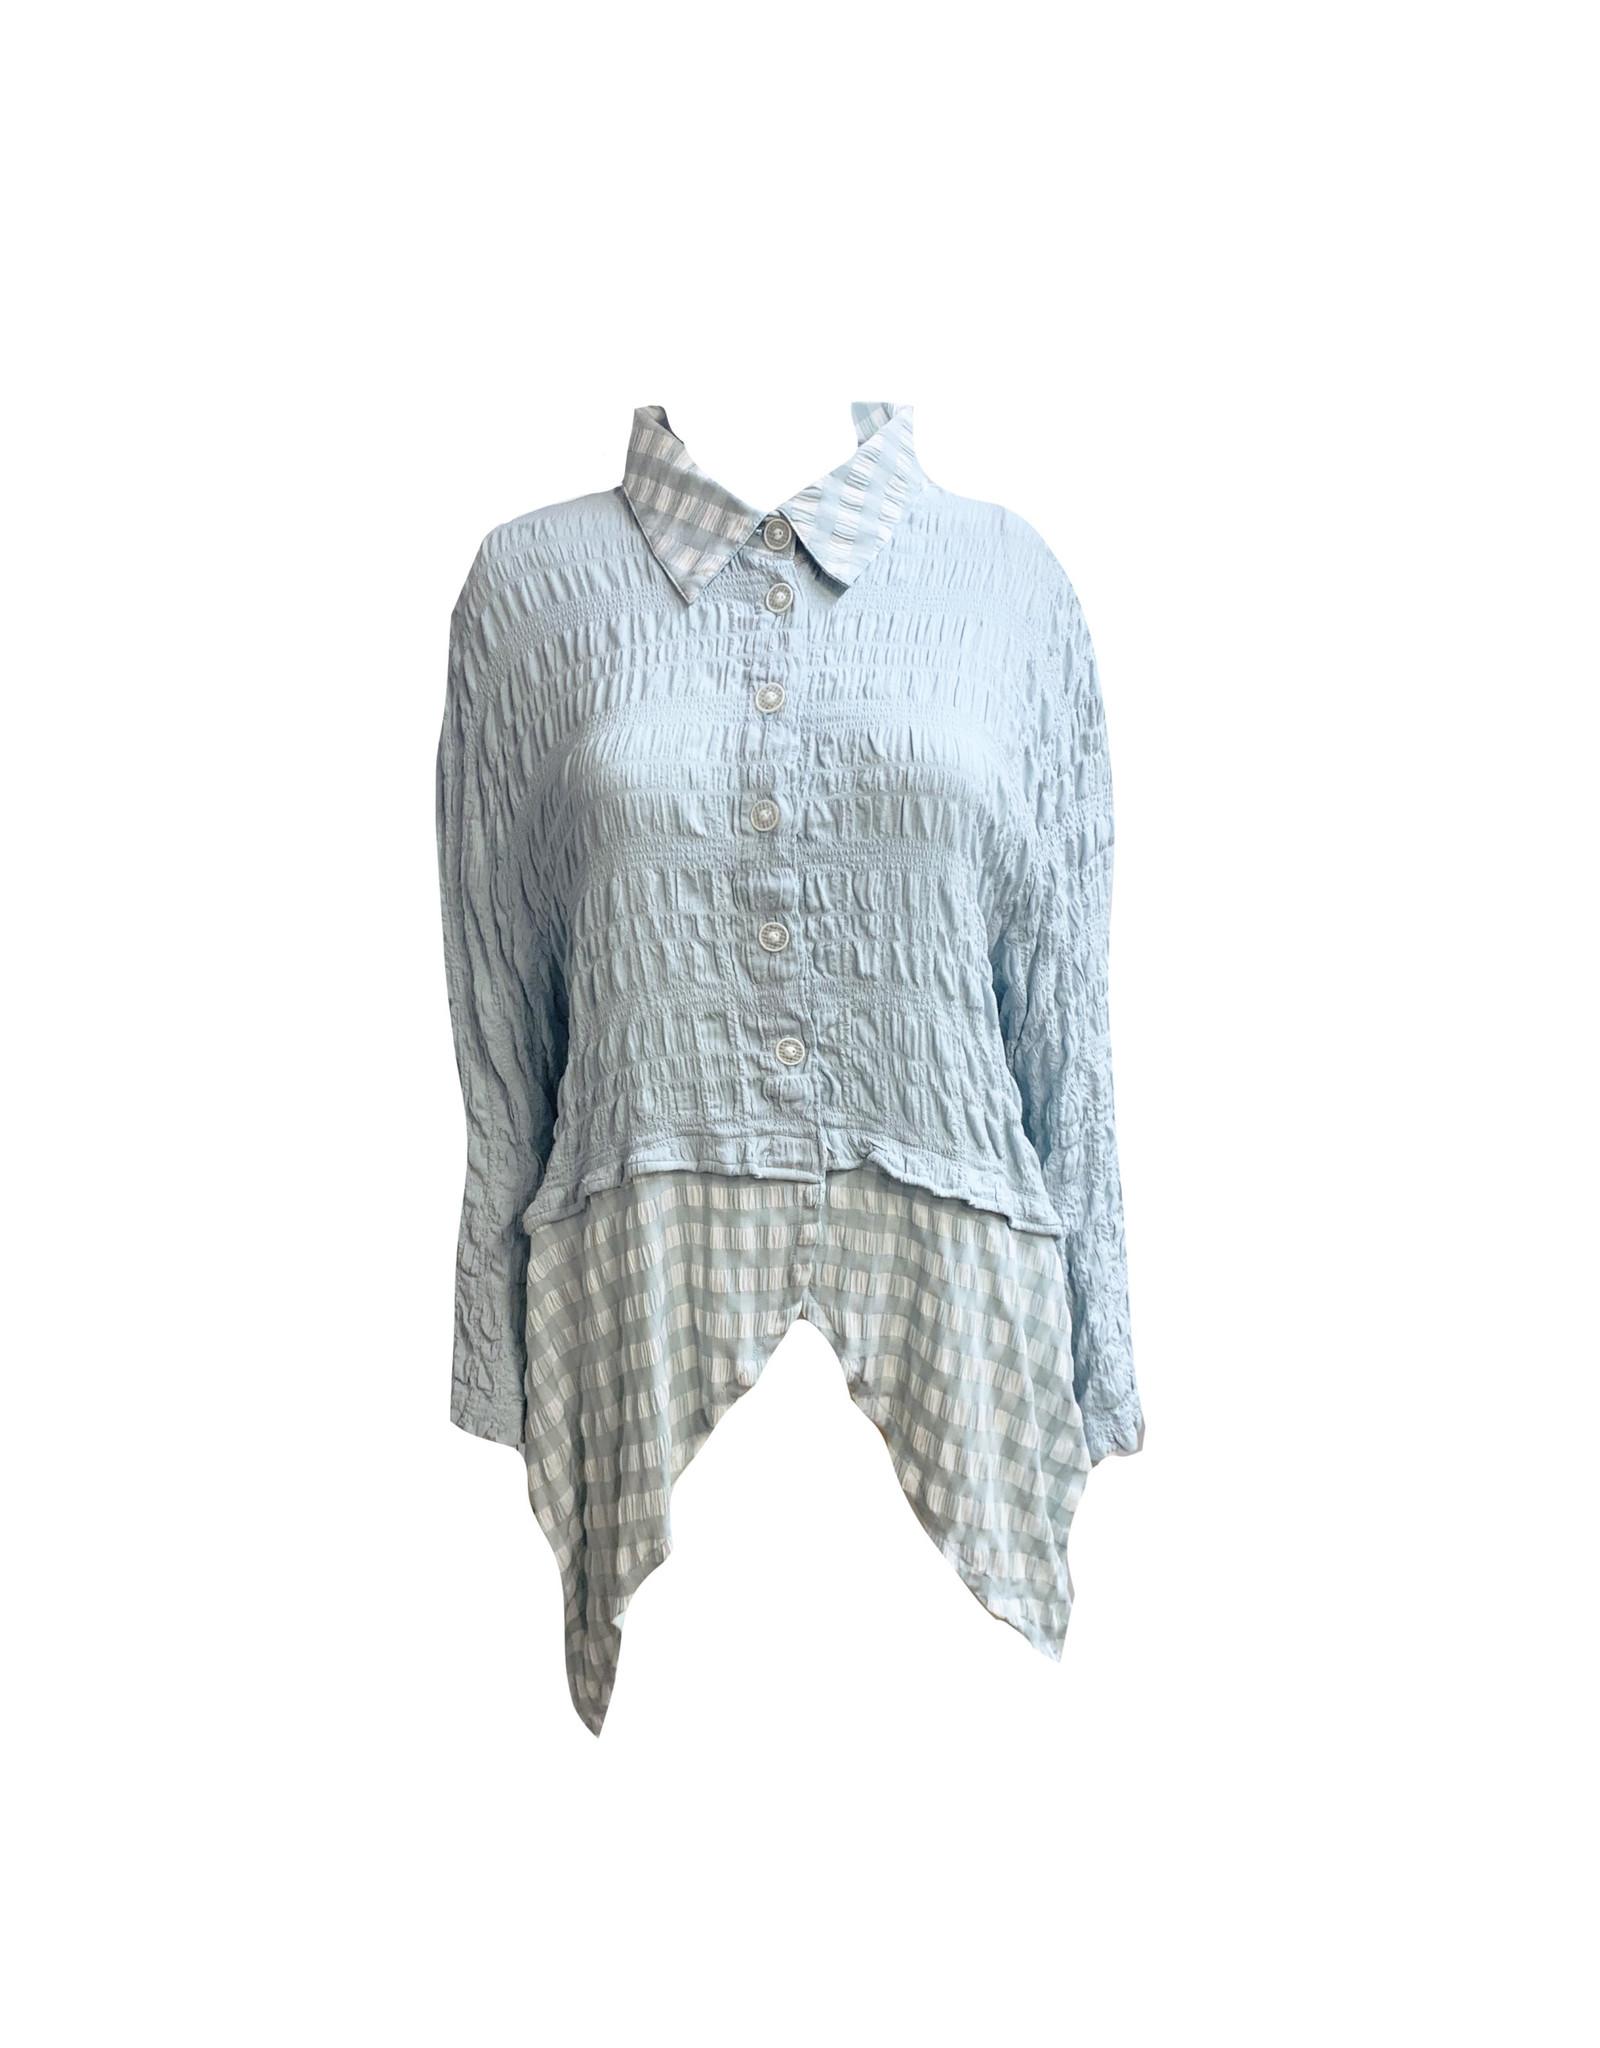 Dress To Kill Dress to Kill Scallop Shirt - One Size